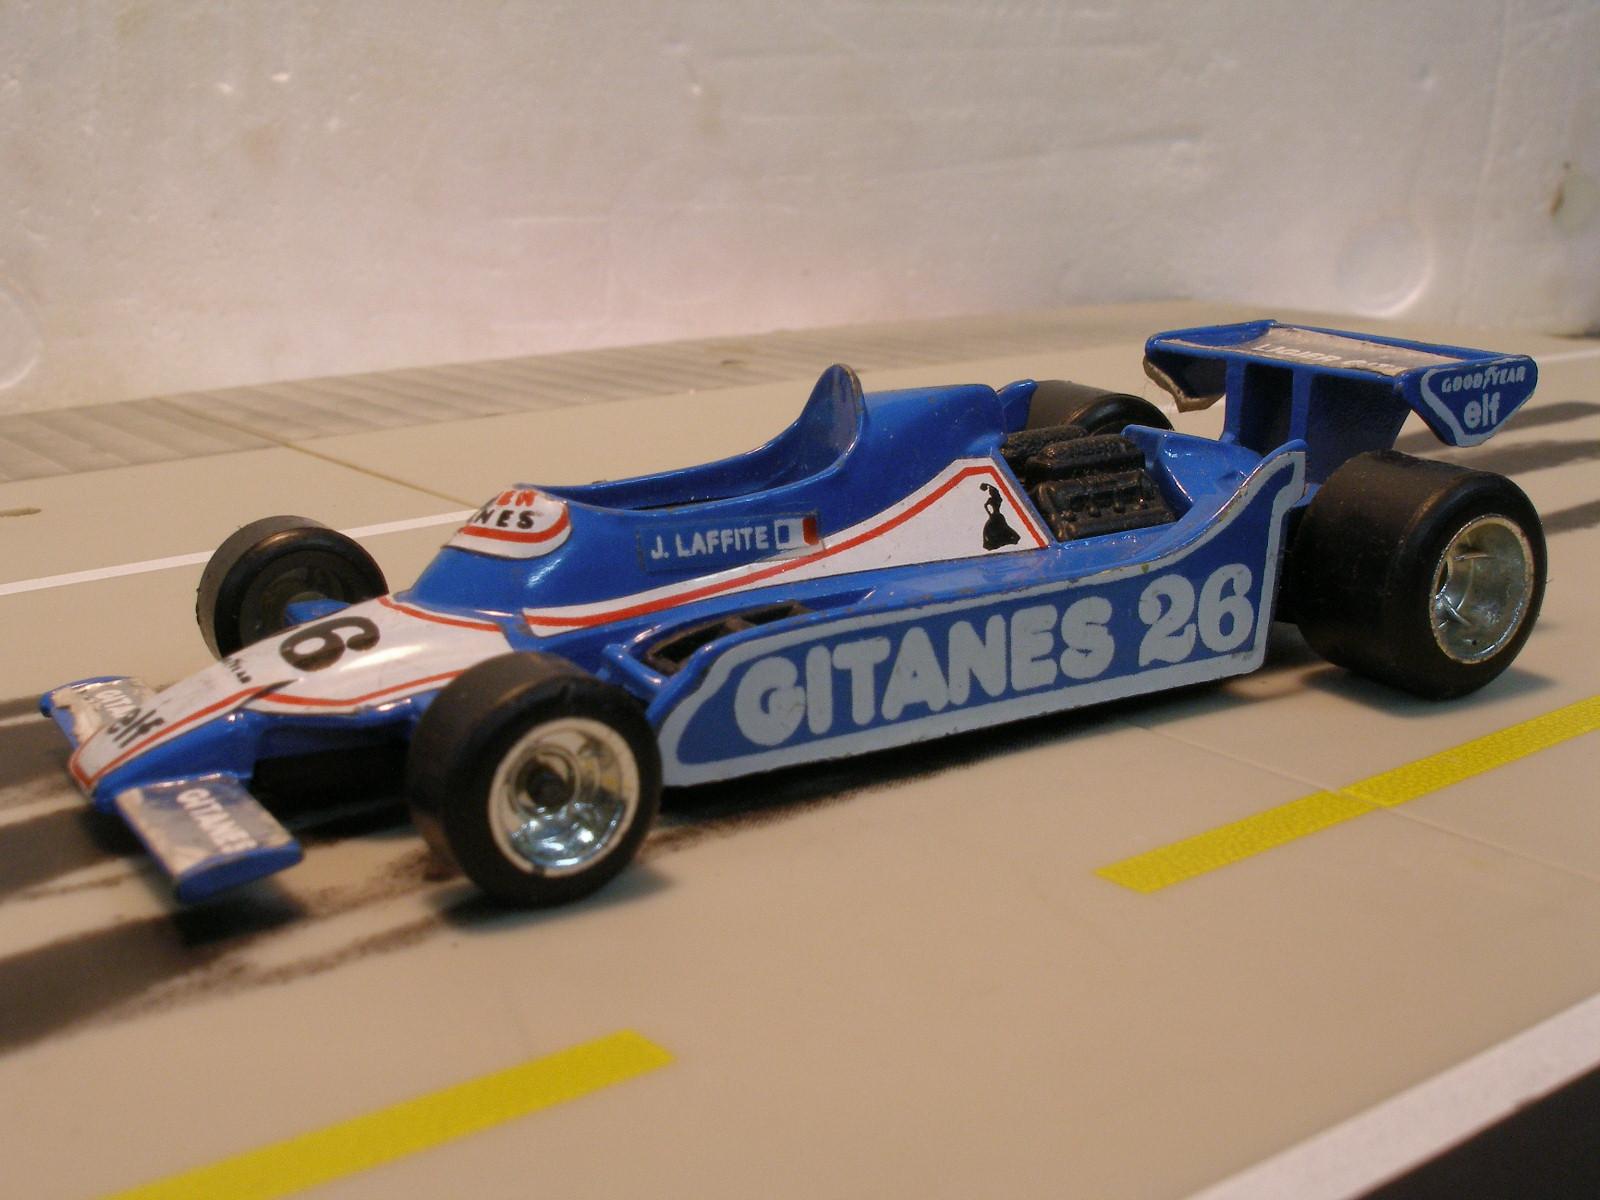 CE118 Ligier F1 JS 11 N°26 Gitanes (cc-by-nc-sa 2.0 Stefho74)